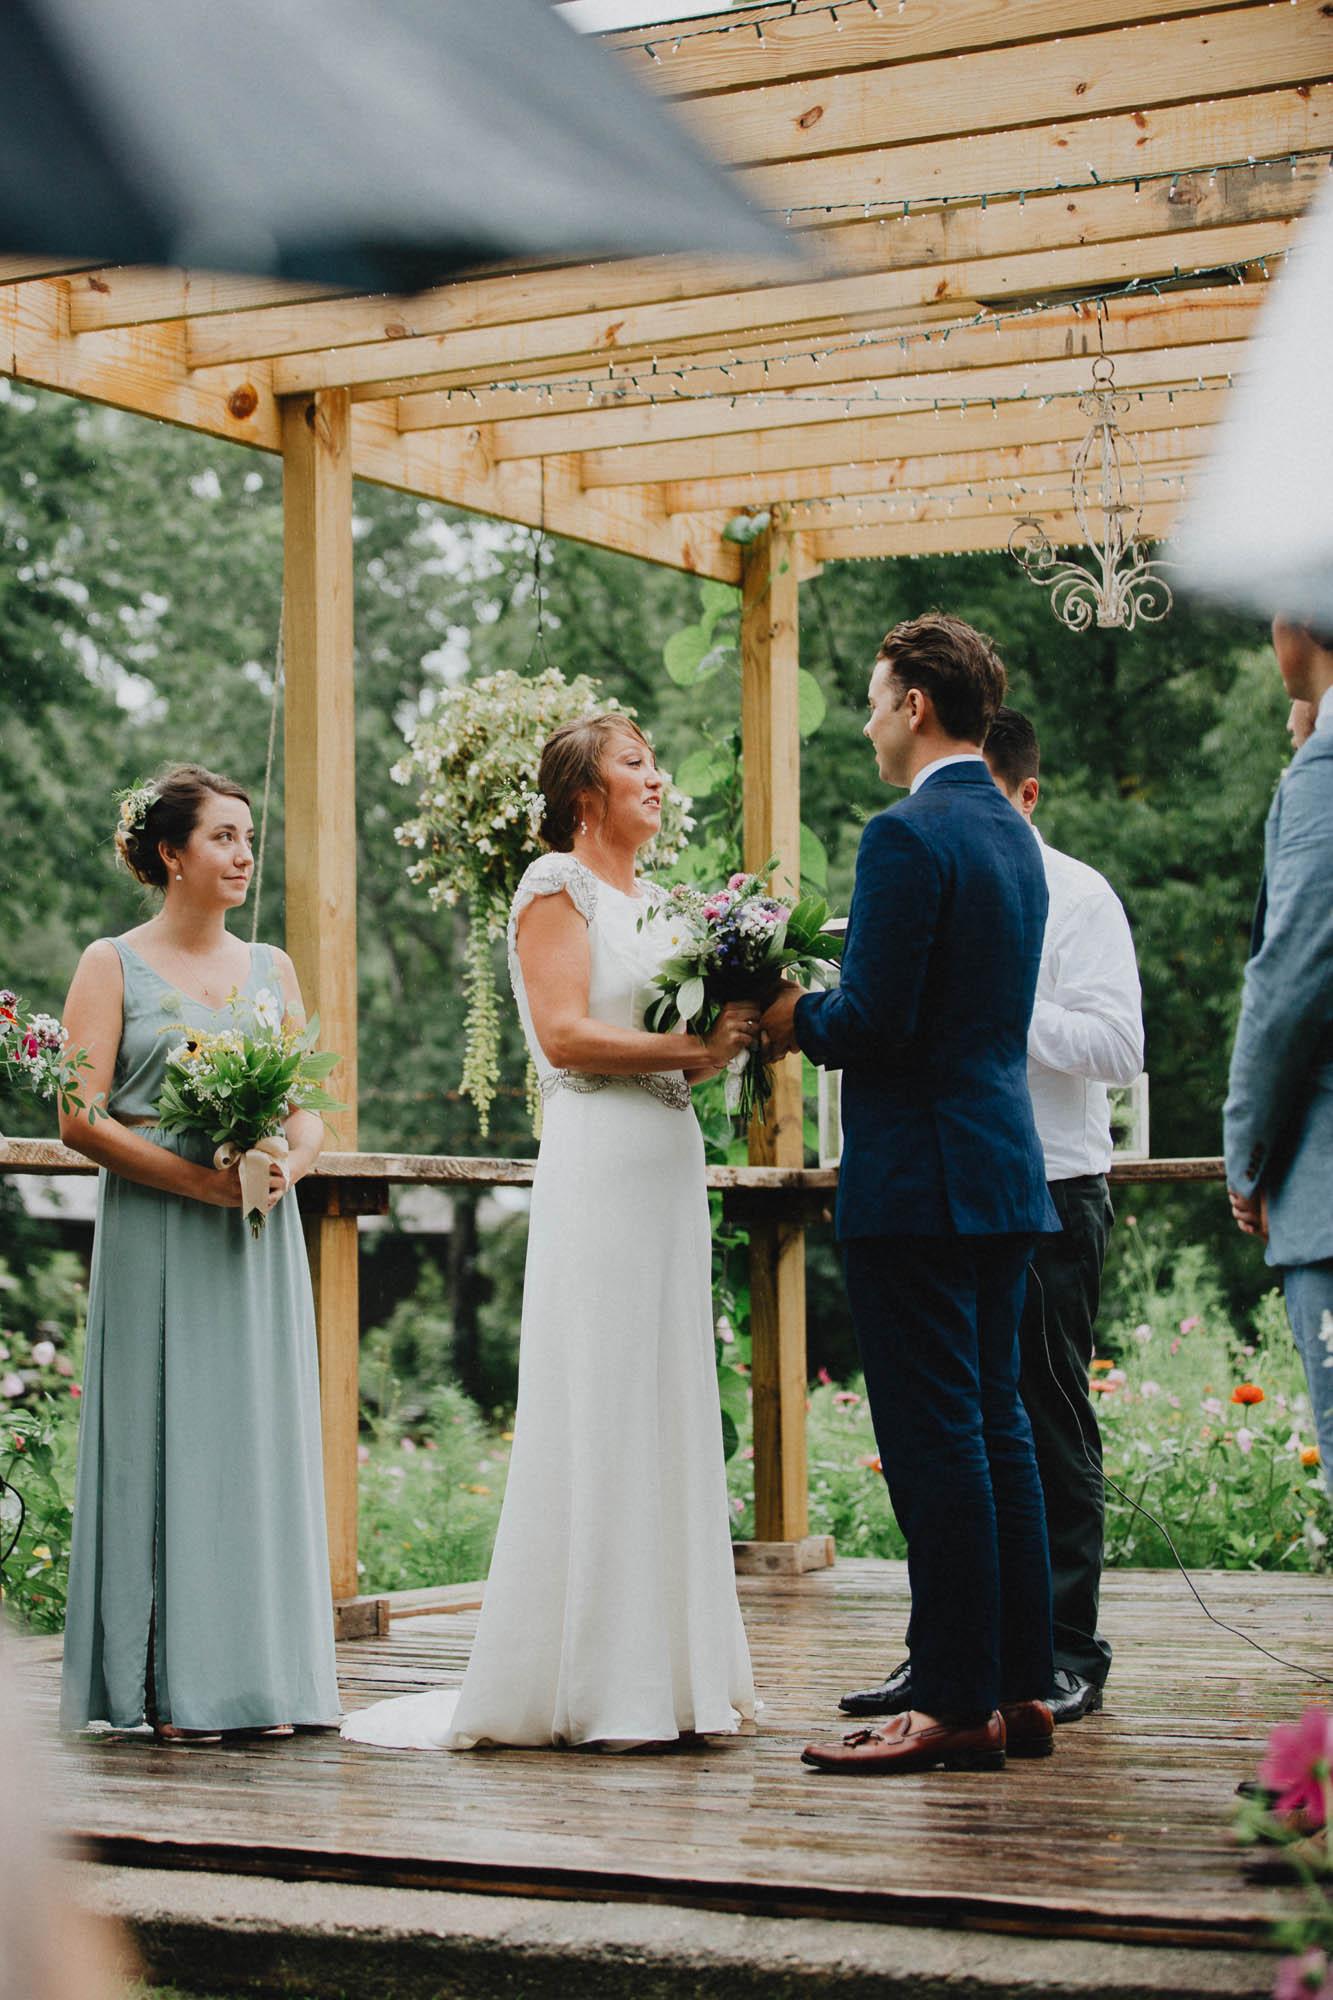 Leah-Graham-Michigan-Outdoor-DIY-Wedding-053@2x.jpg